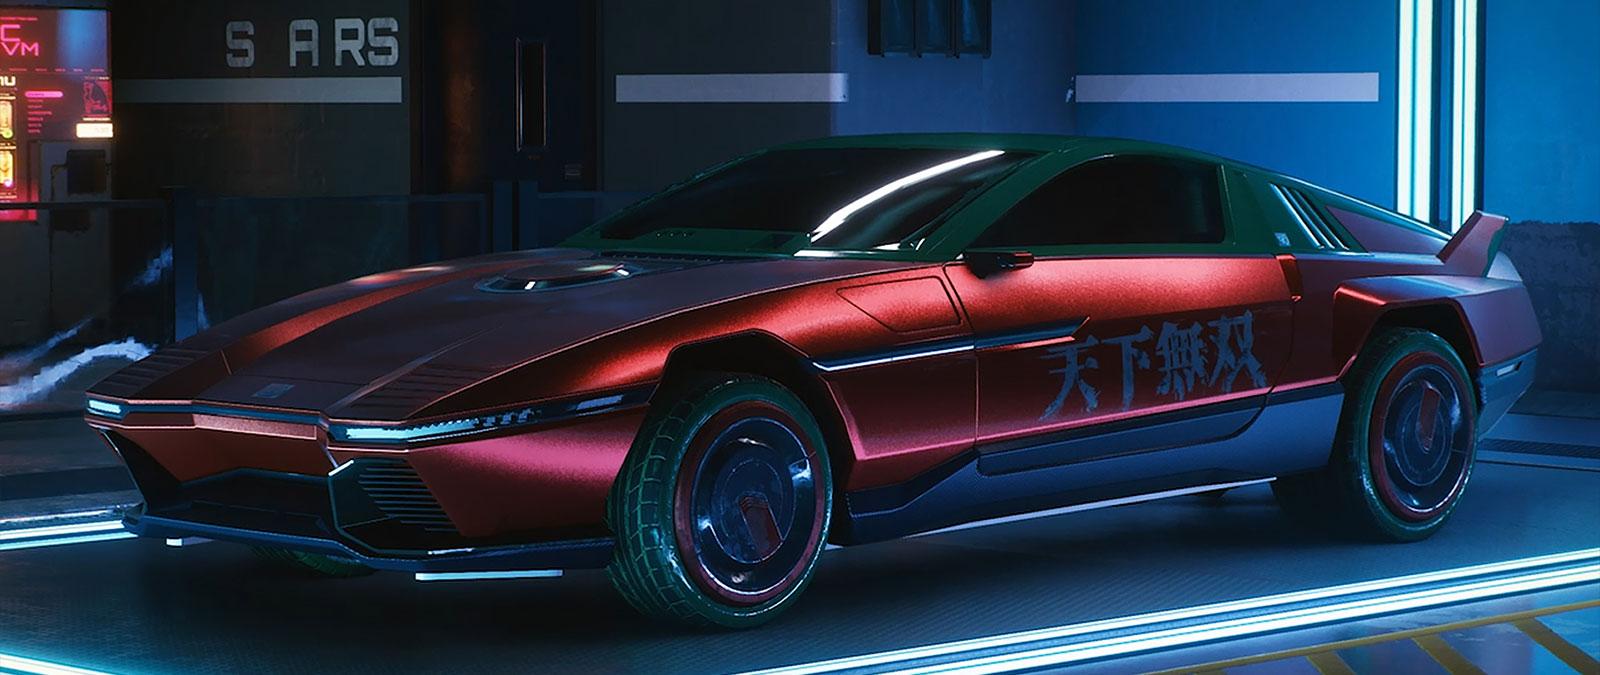 A sleek futuristic car